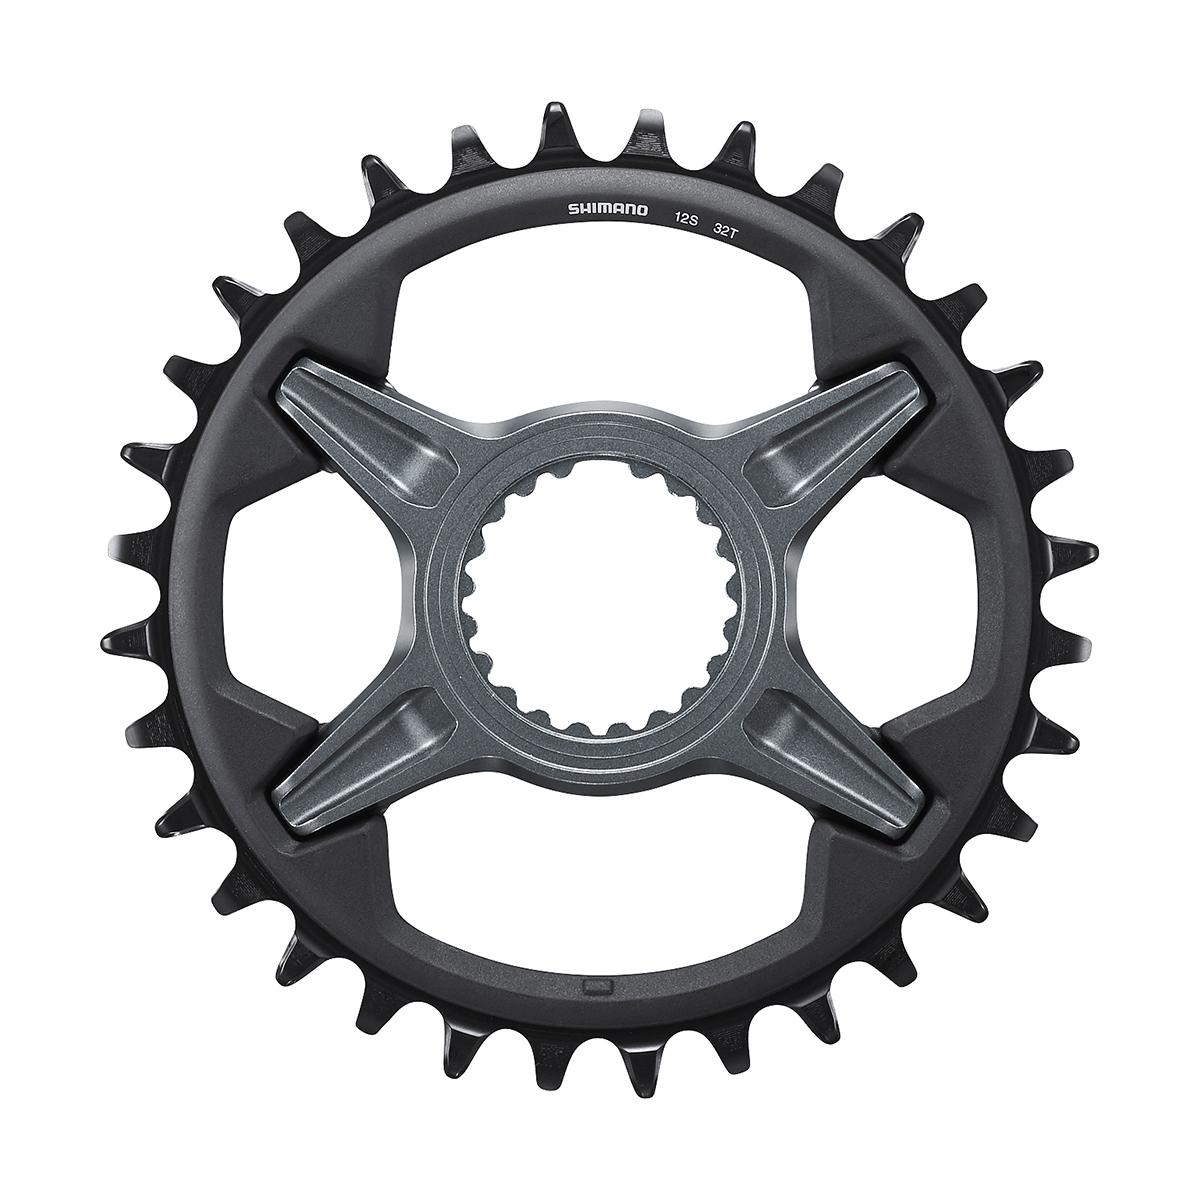 Shimano SLX Chainring 12-speed